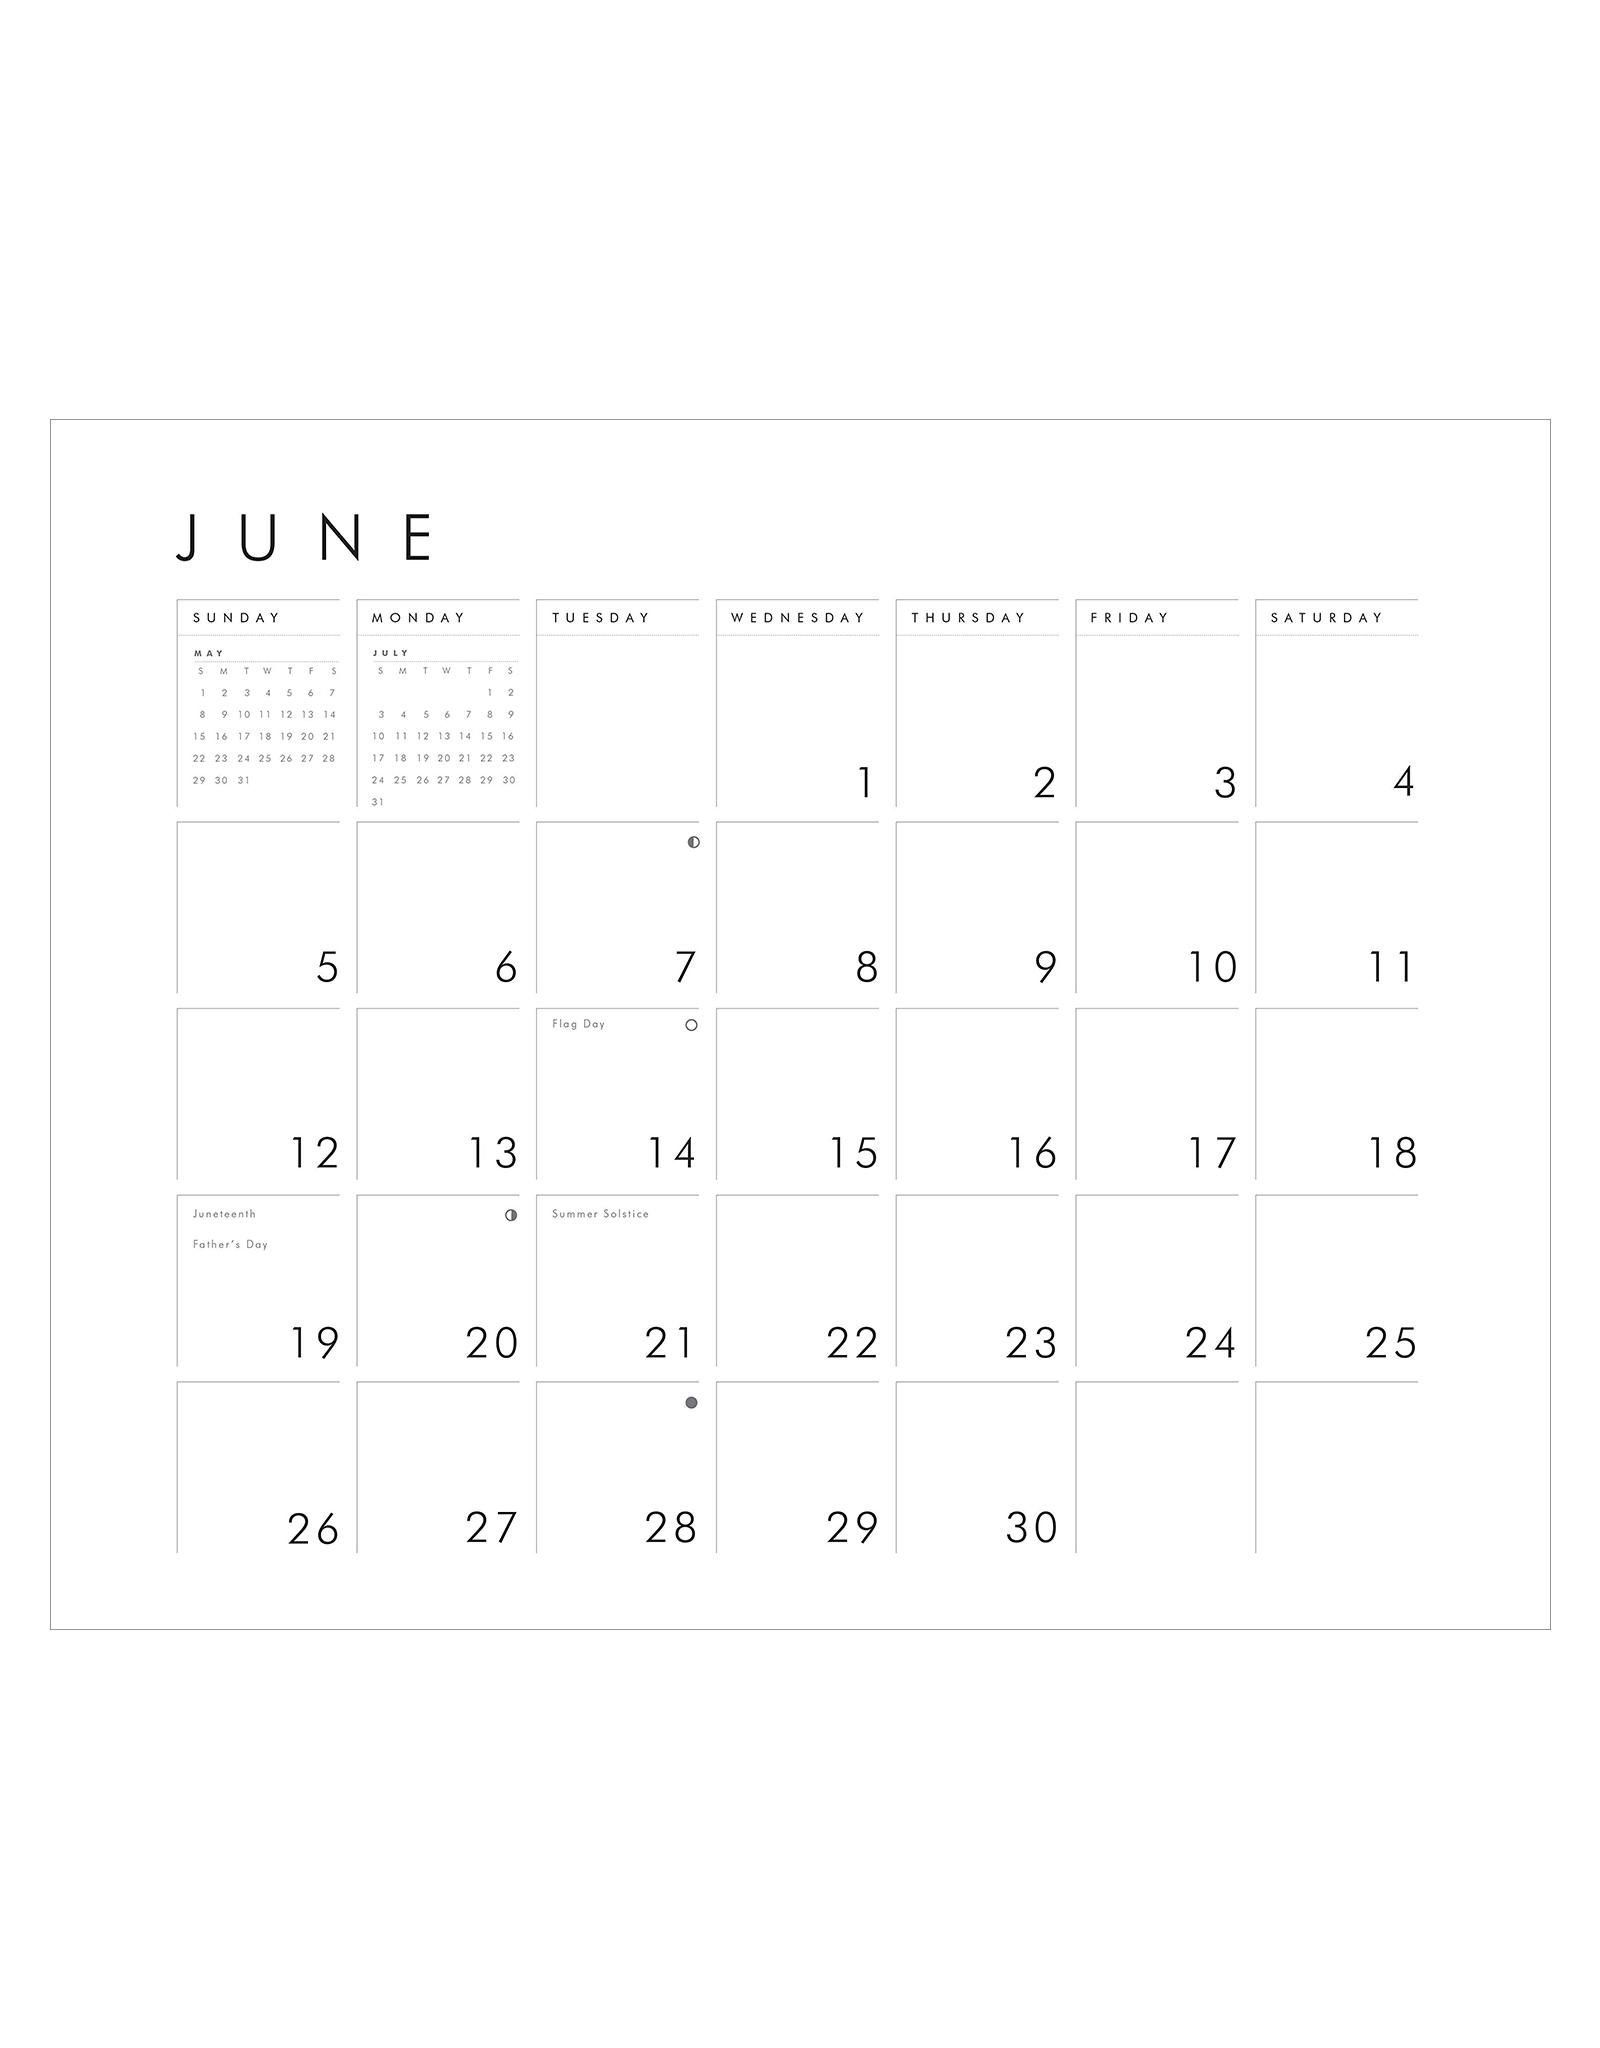 Ansel Adams 2022 Wall Calendar